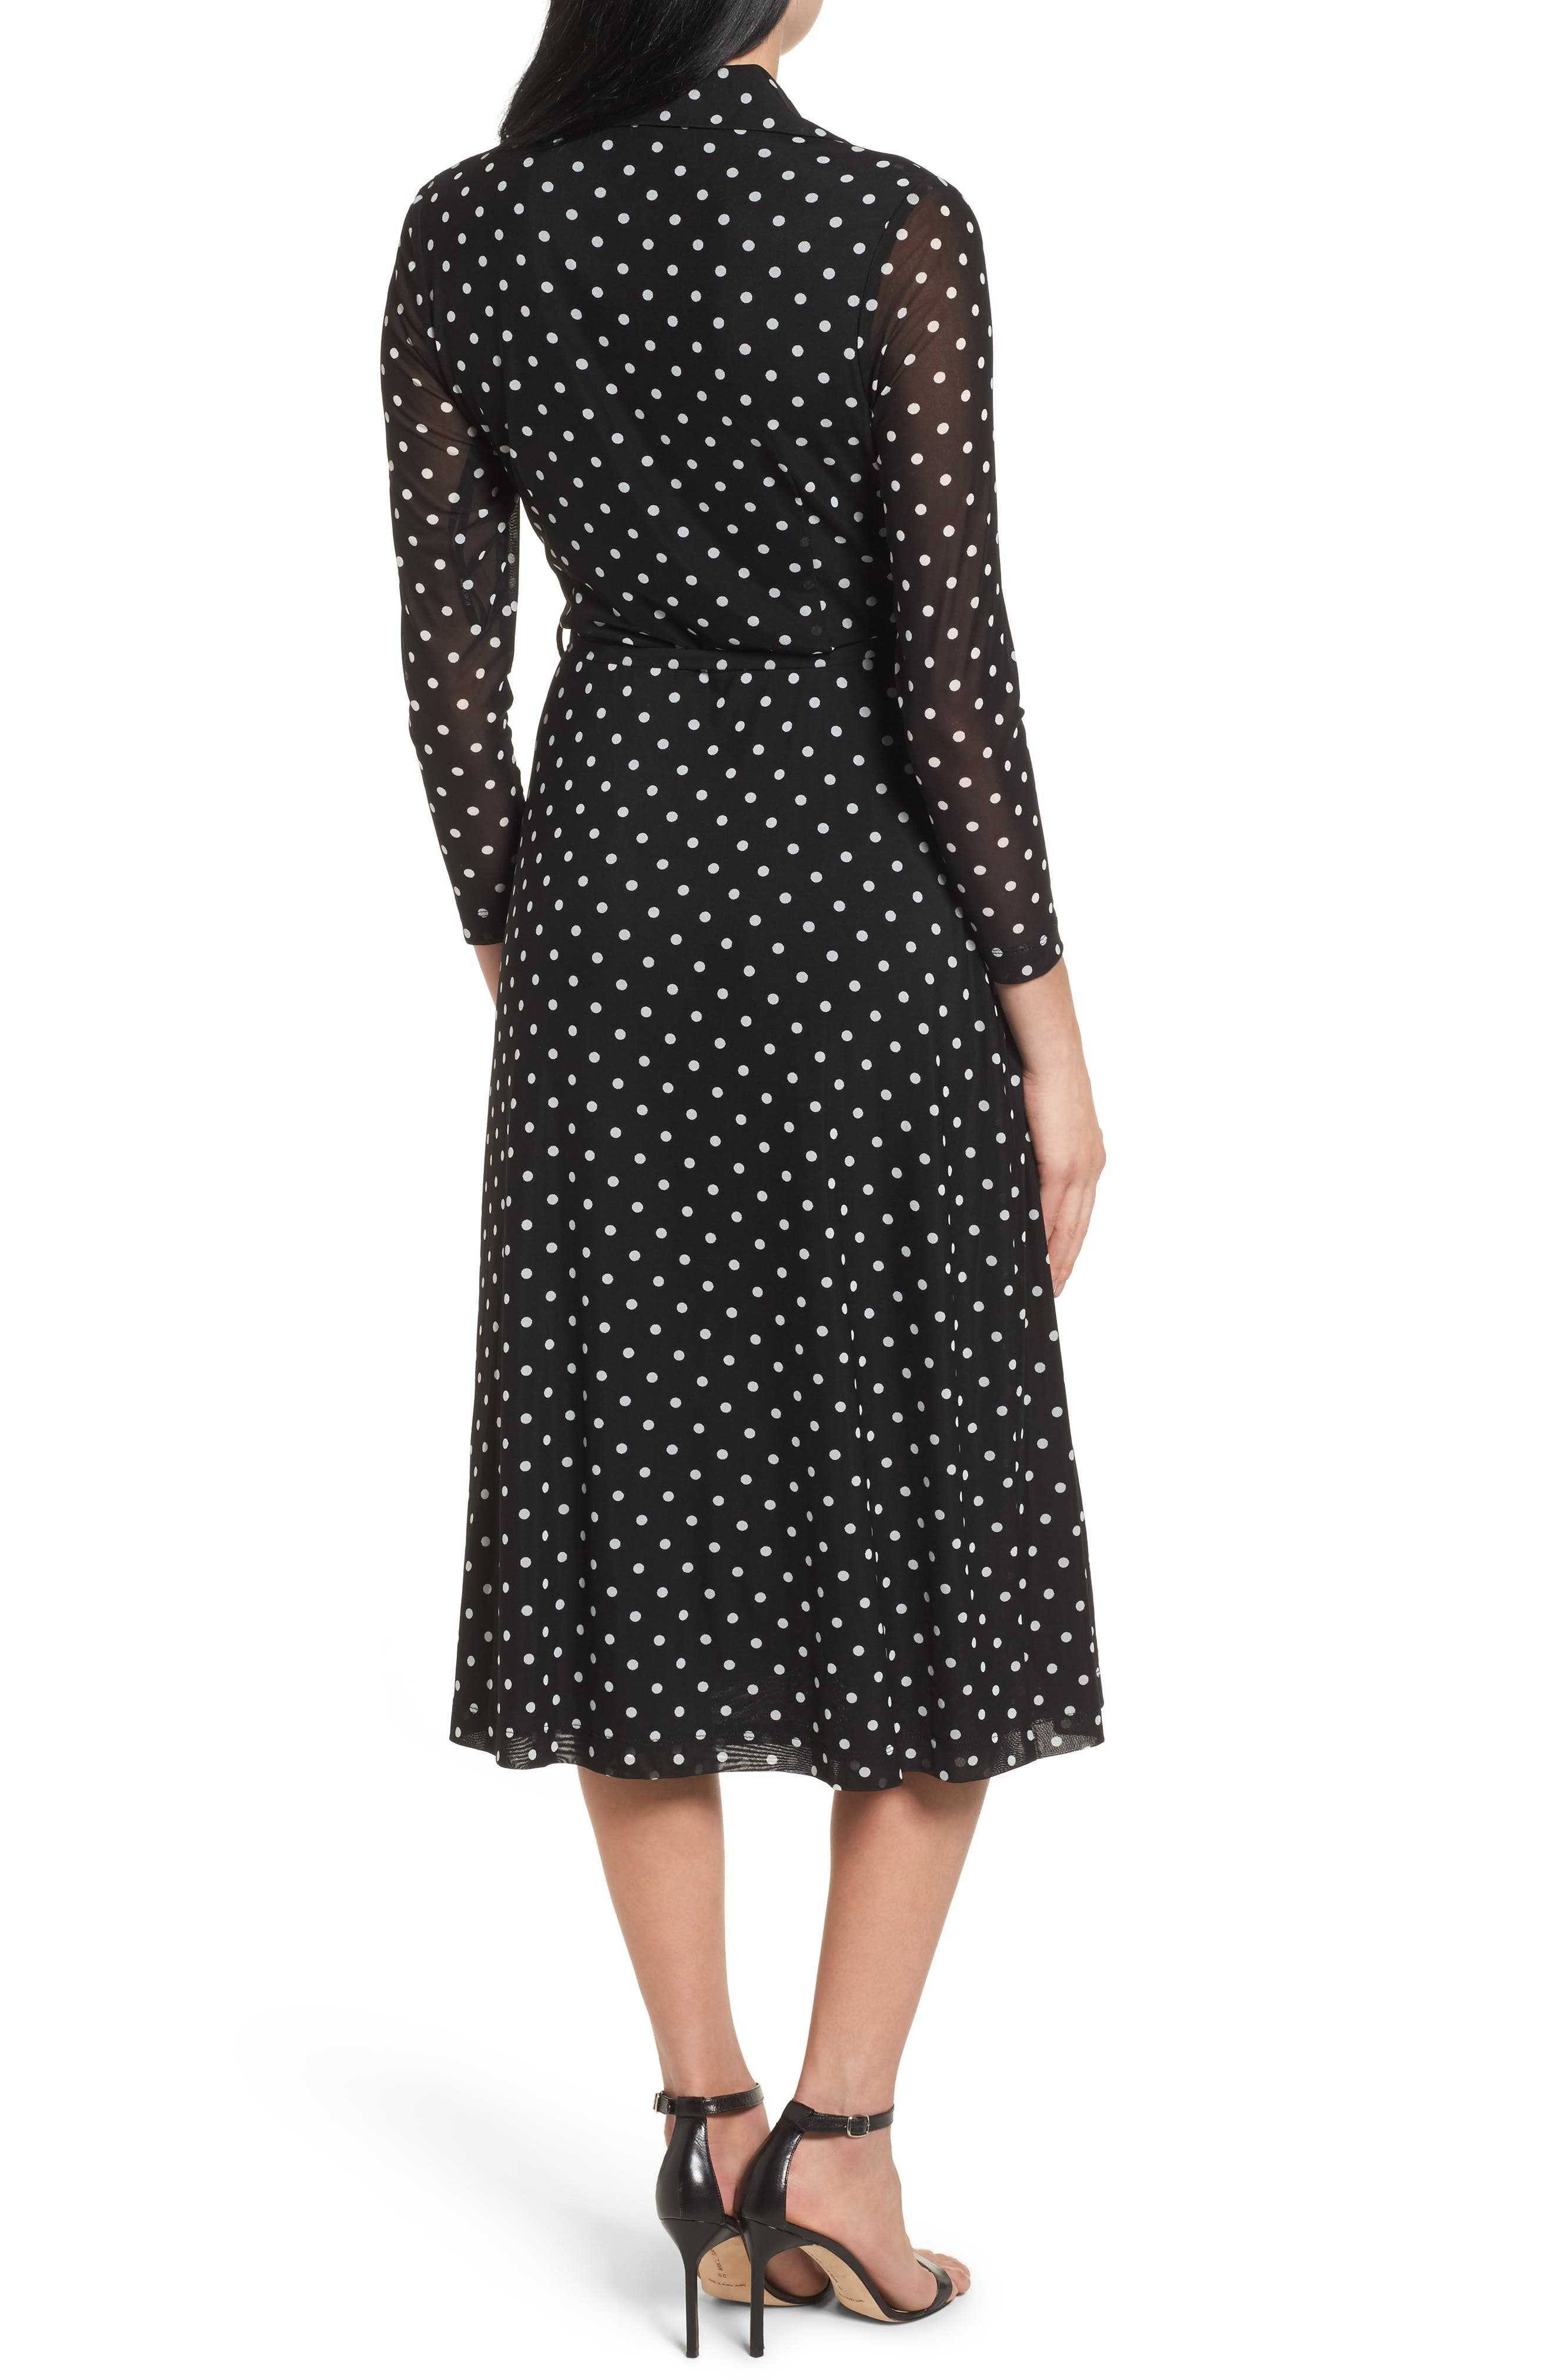 Polka Dot Shirt Dress,                             Alternate thumbnail 2, color,                             Black/ White